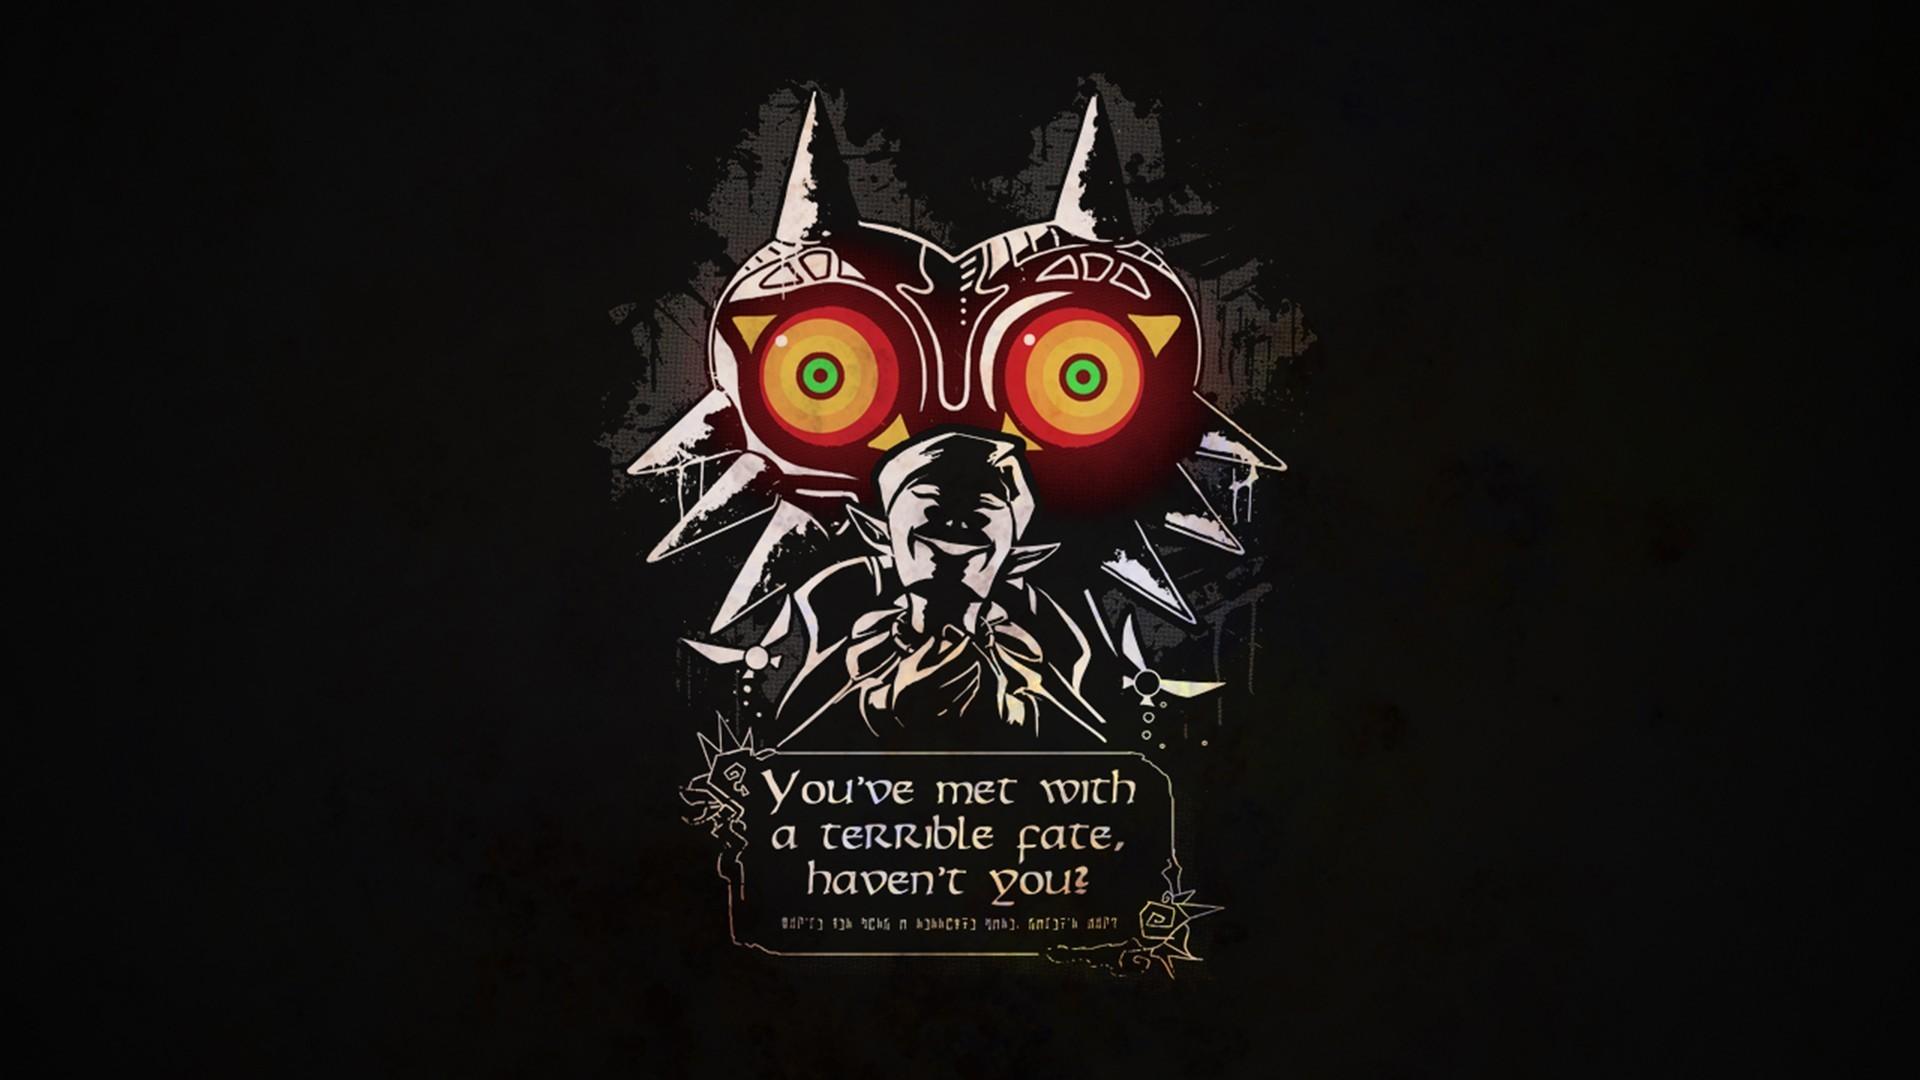 Majora's Mask – The Legends of Zelda wallpaper – 1010751